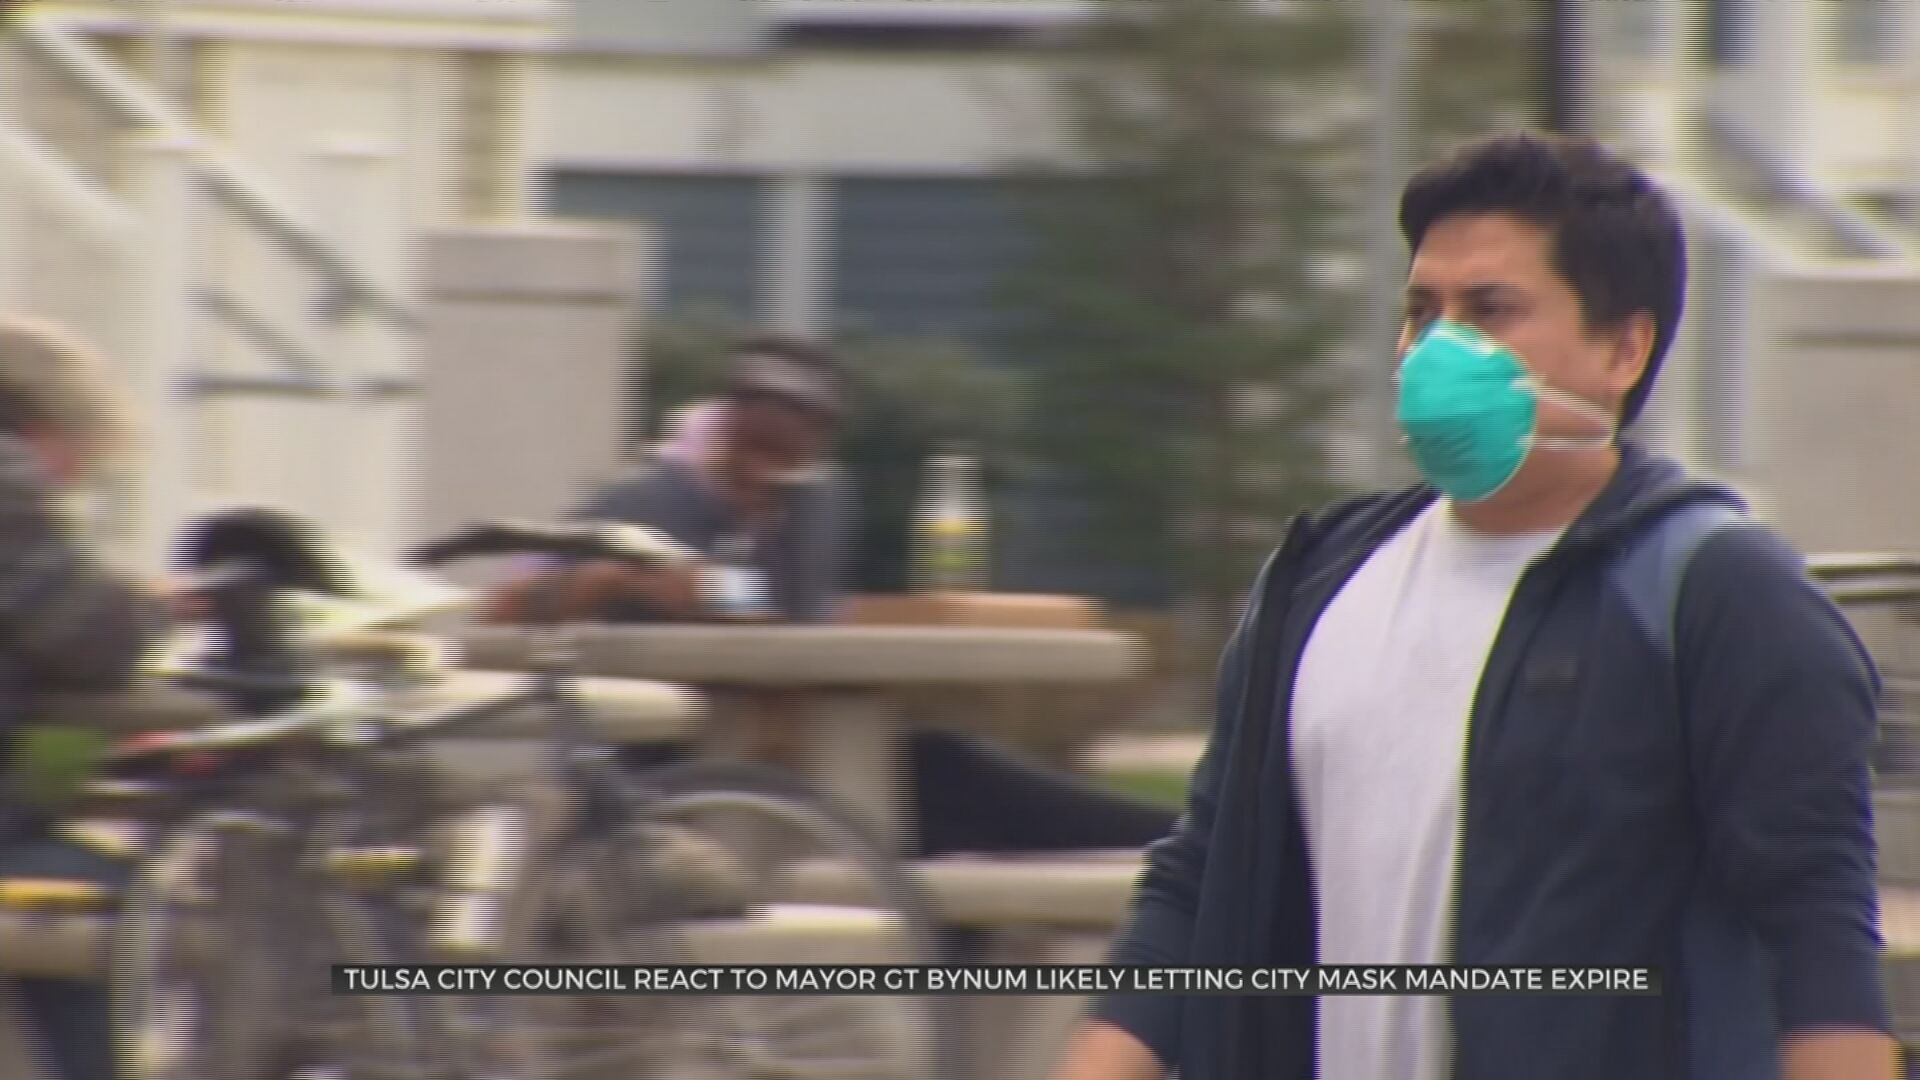 Tulsa City Councilors Draft Backup Plan To Reinstate Mask Mandate If Necessary